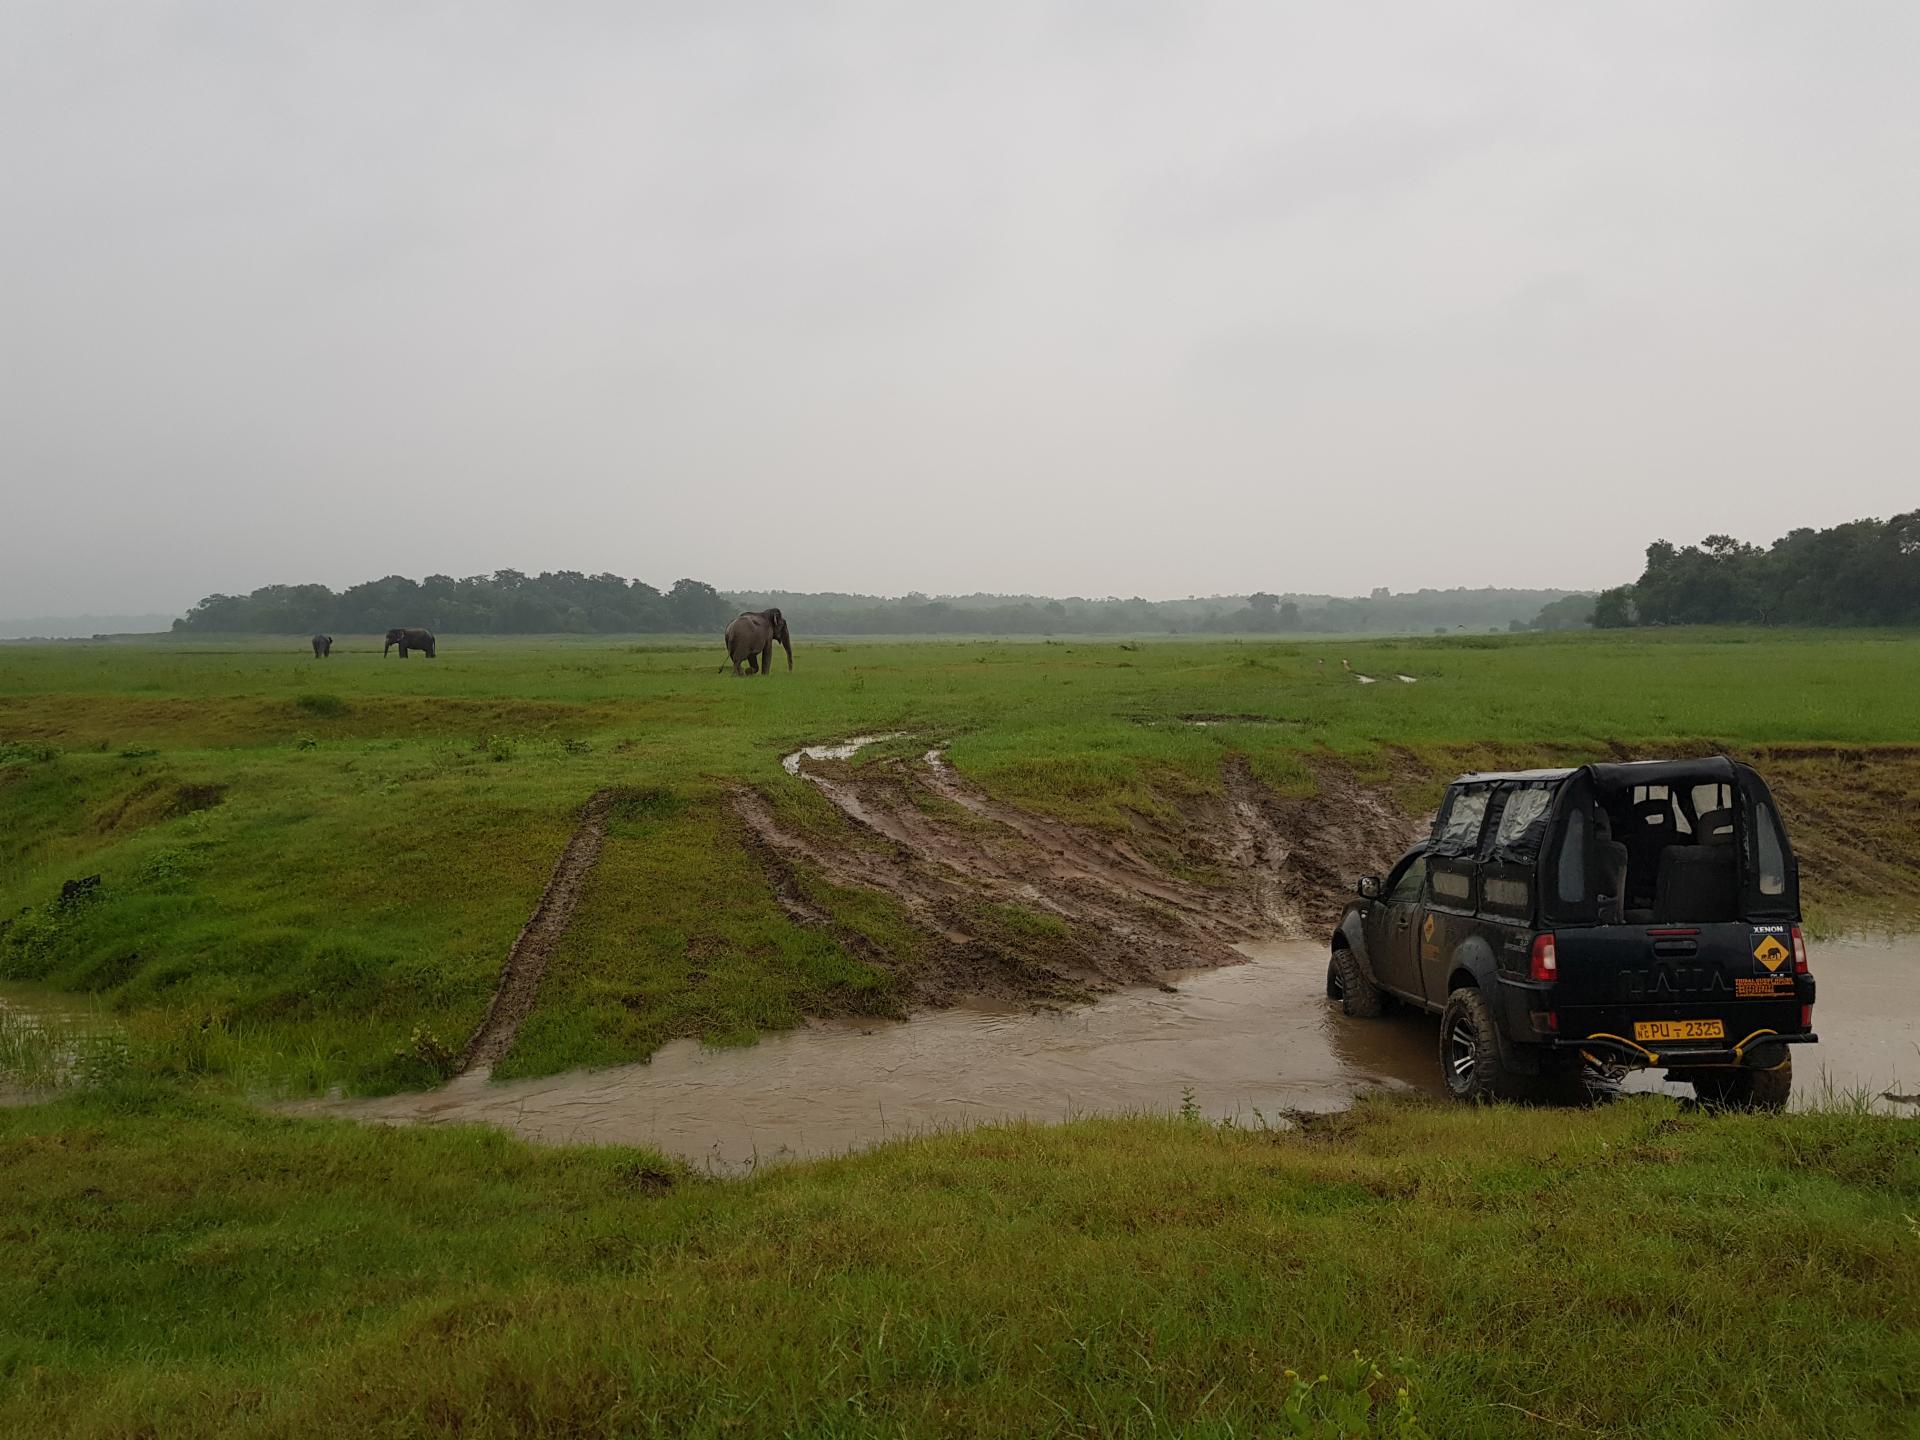 Сафари на джипах, Национальный парк Каудулла, Шри-Ланка.